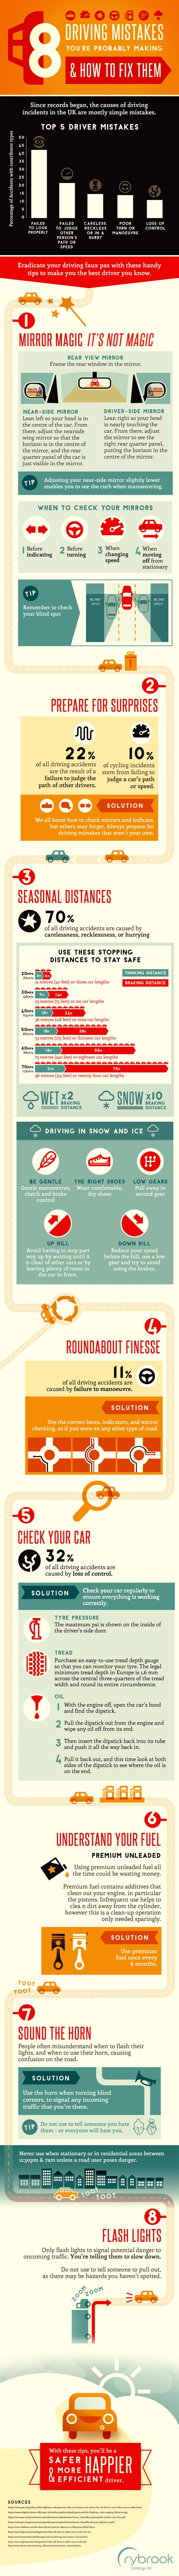 Rybrooks Infographic